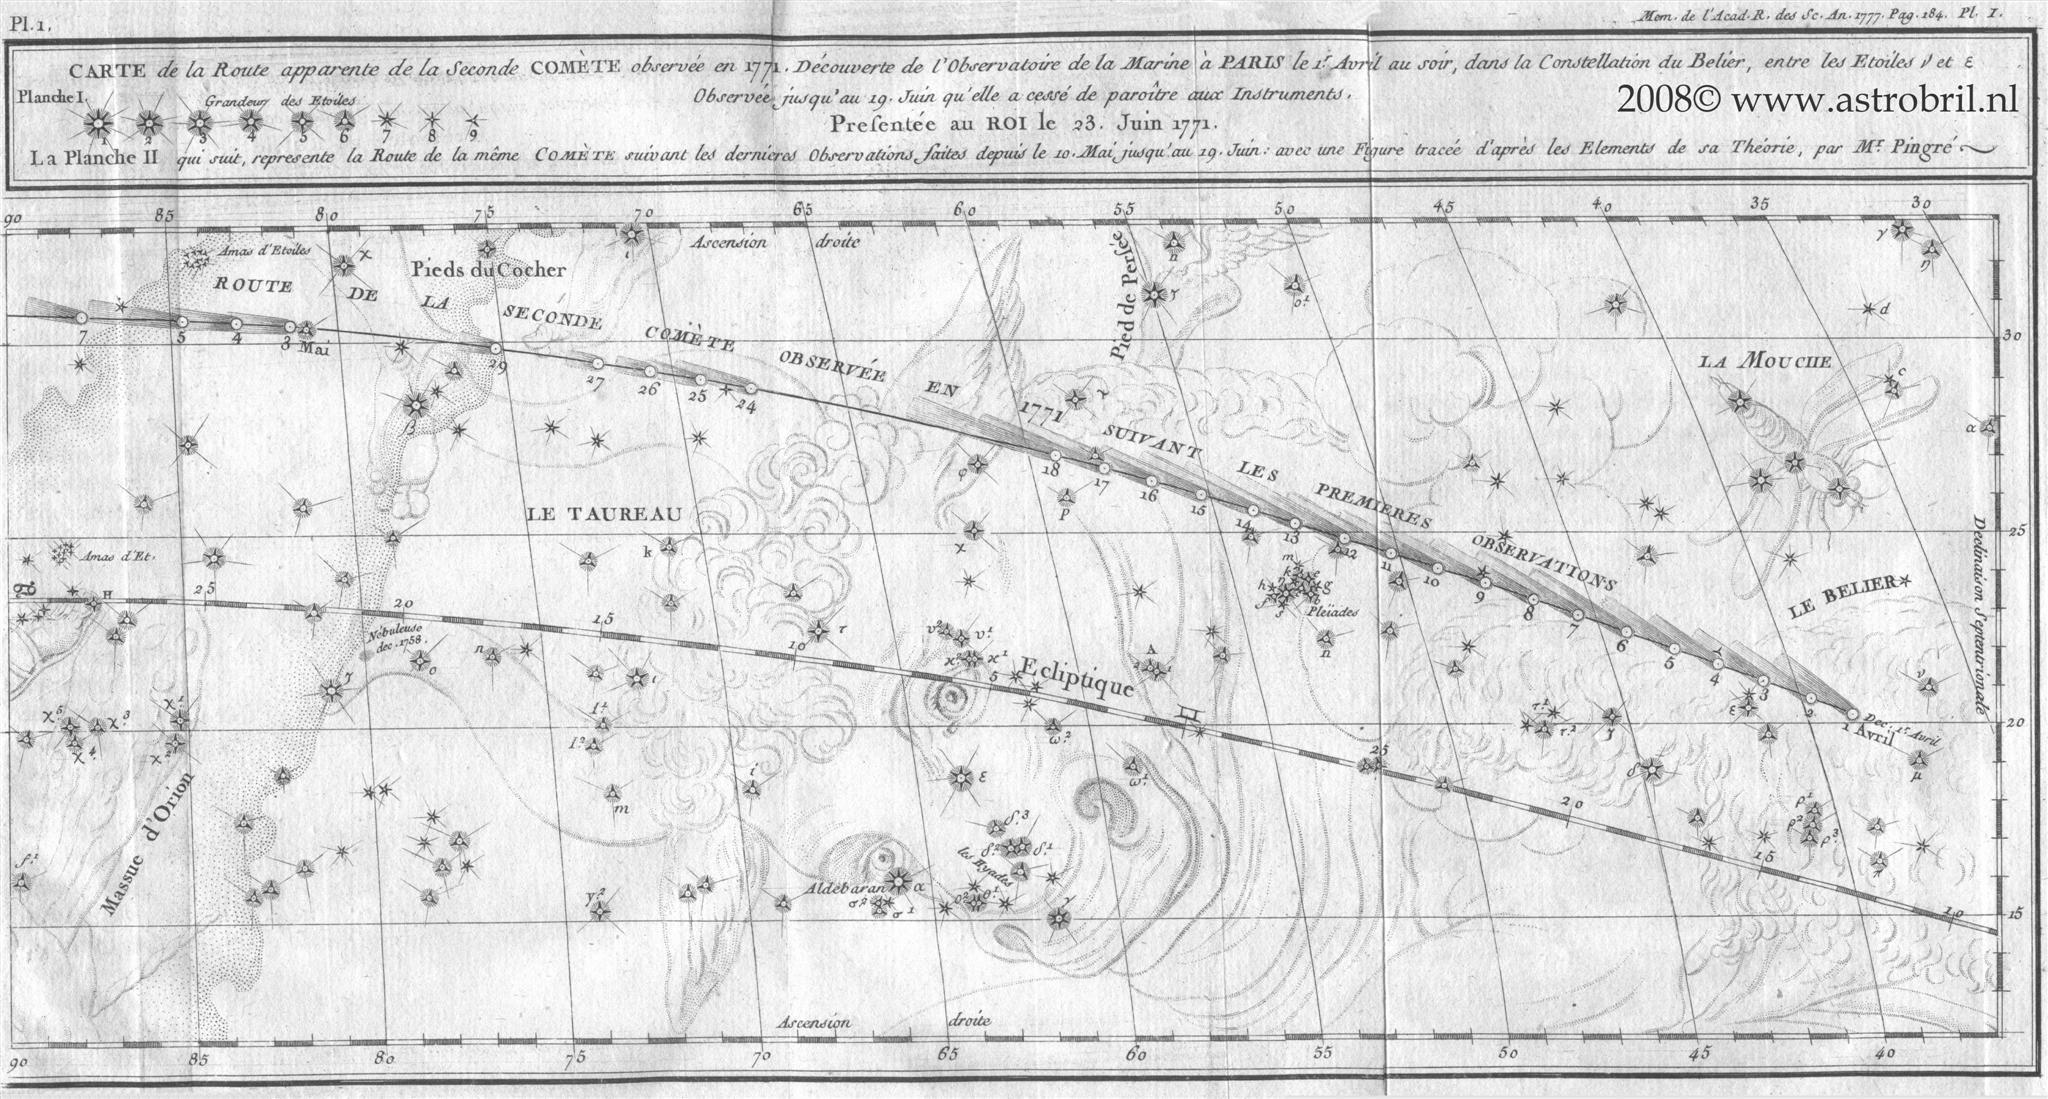 Comet C/1771 G1 (Messier) - I